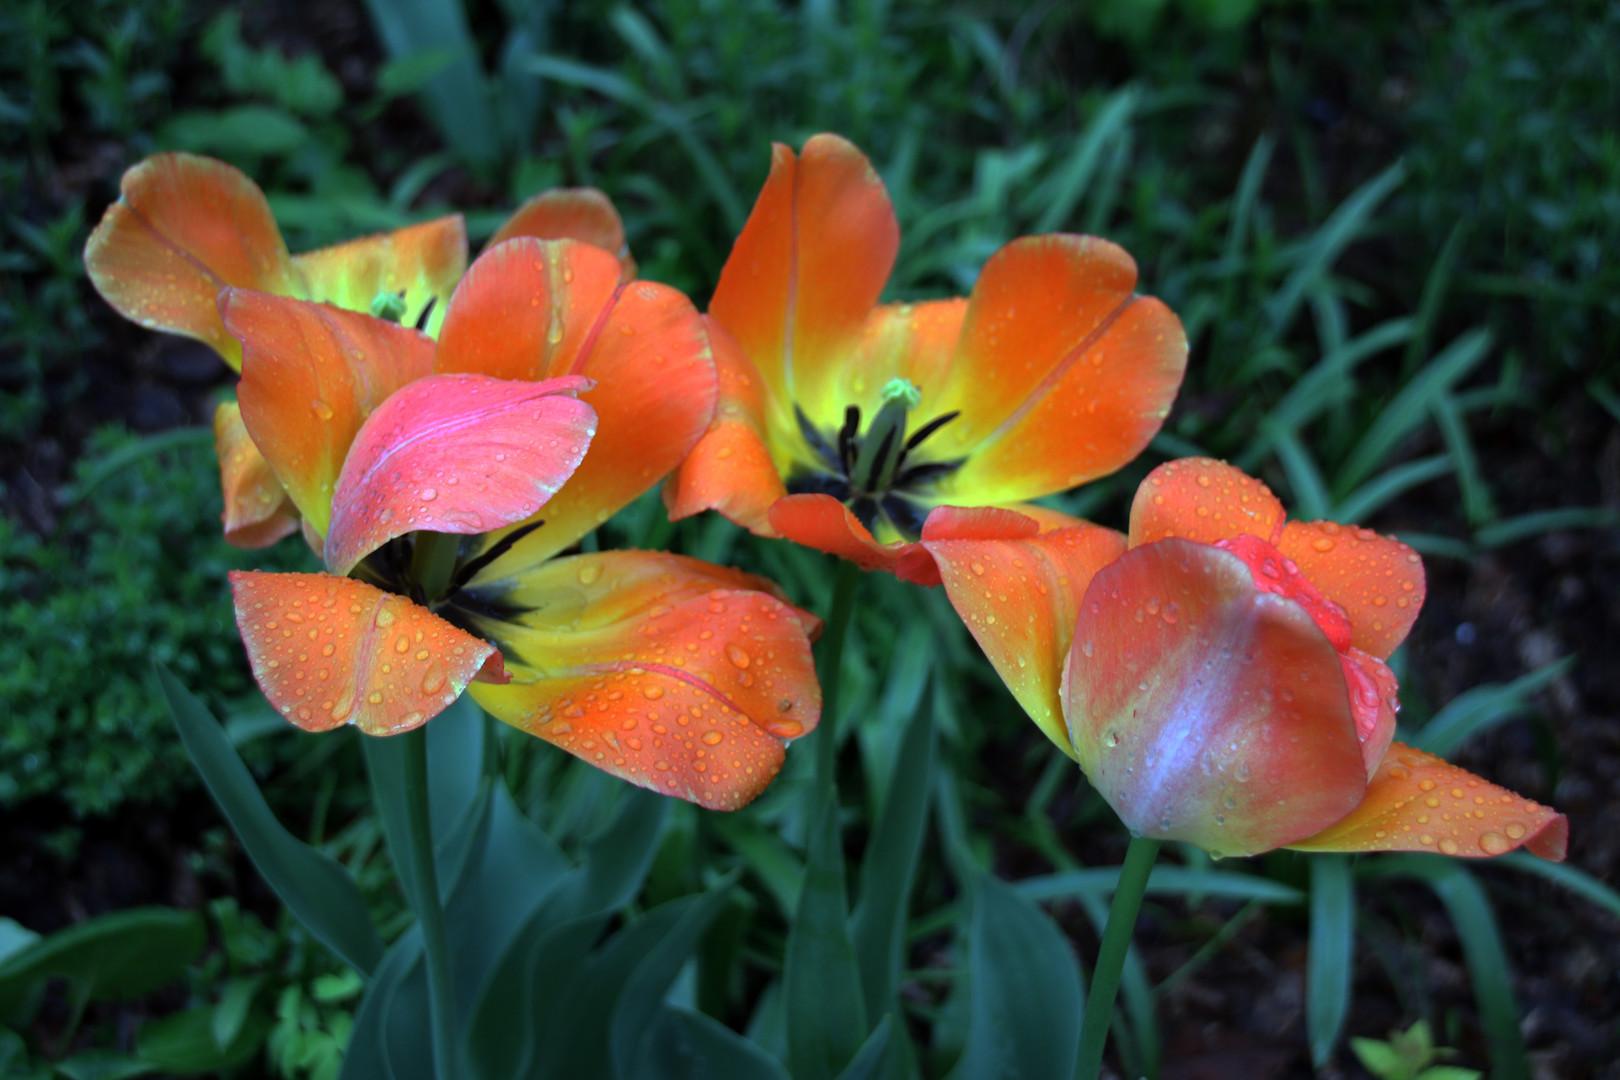 Orange tulips past peak 3 ACG May 13, 20